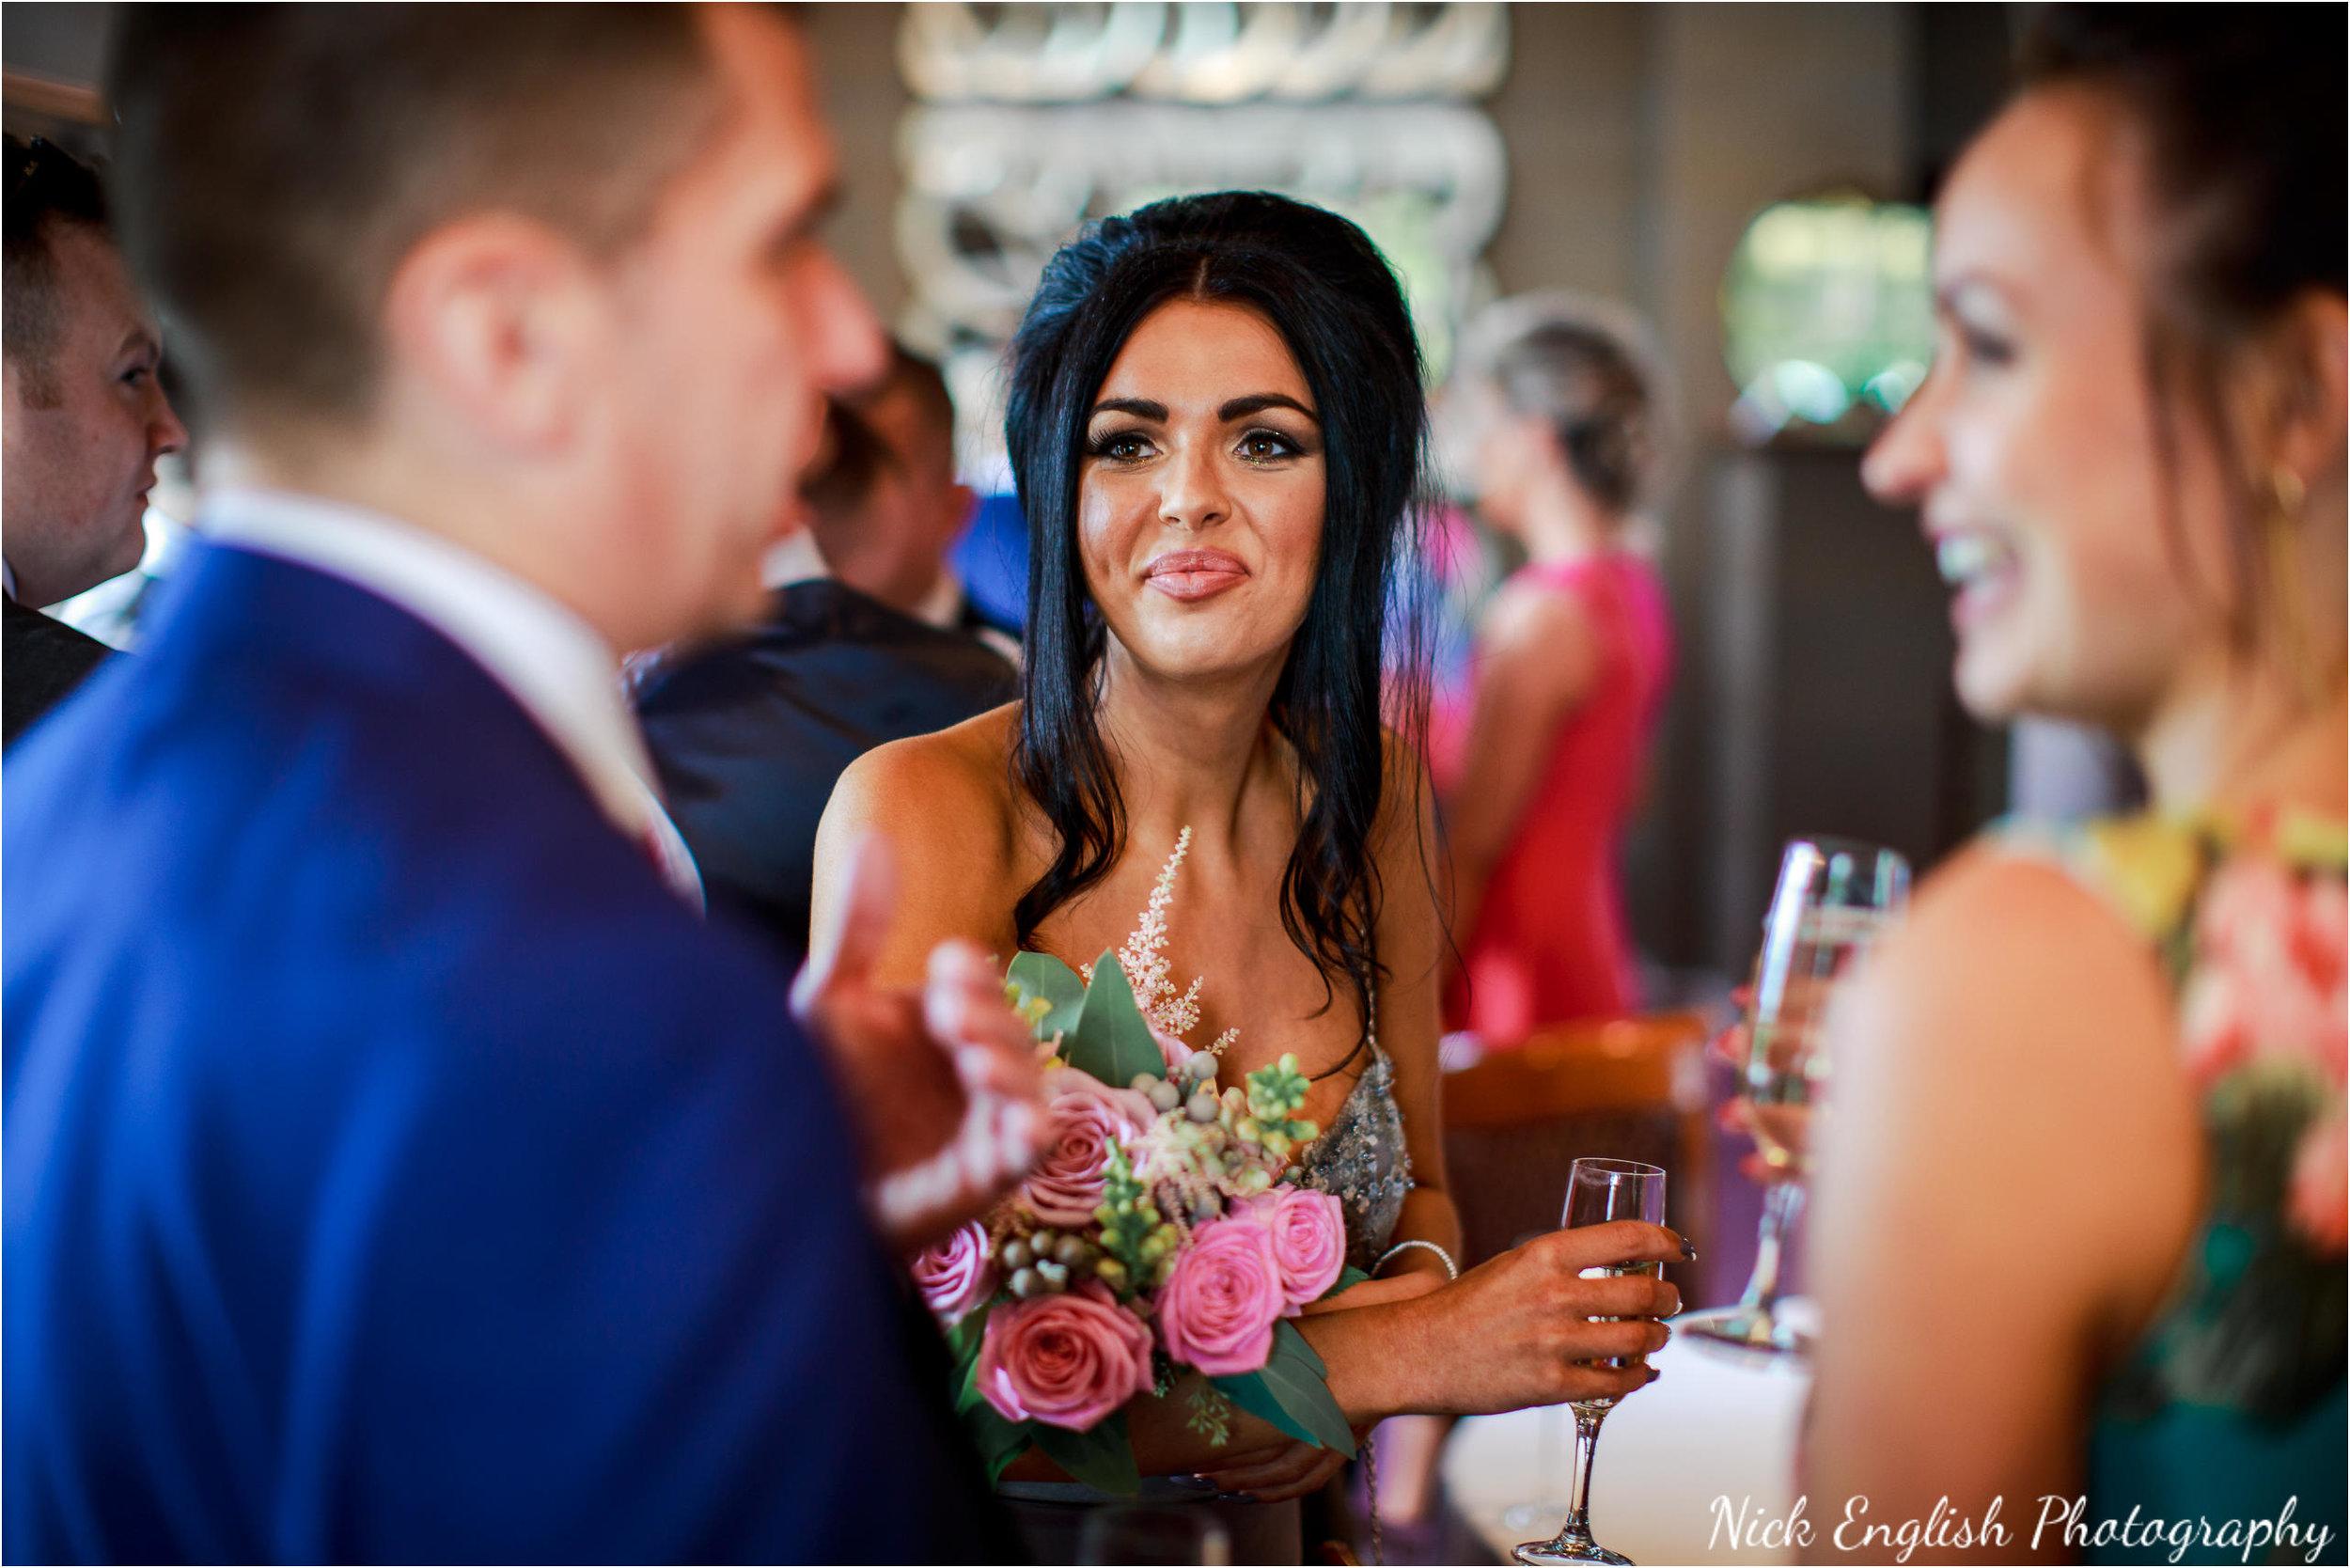 Stacey-Ash-Wedding-Photographs-Stanley-House-Preston-Lancashire-109.jpg